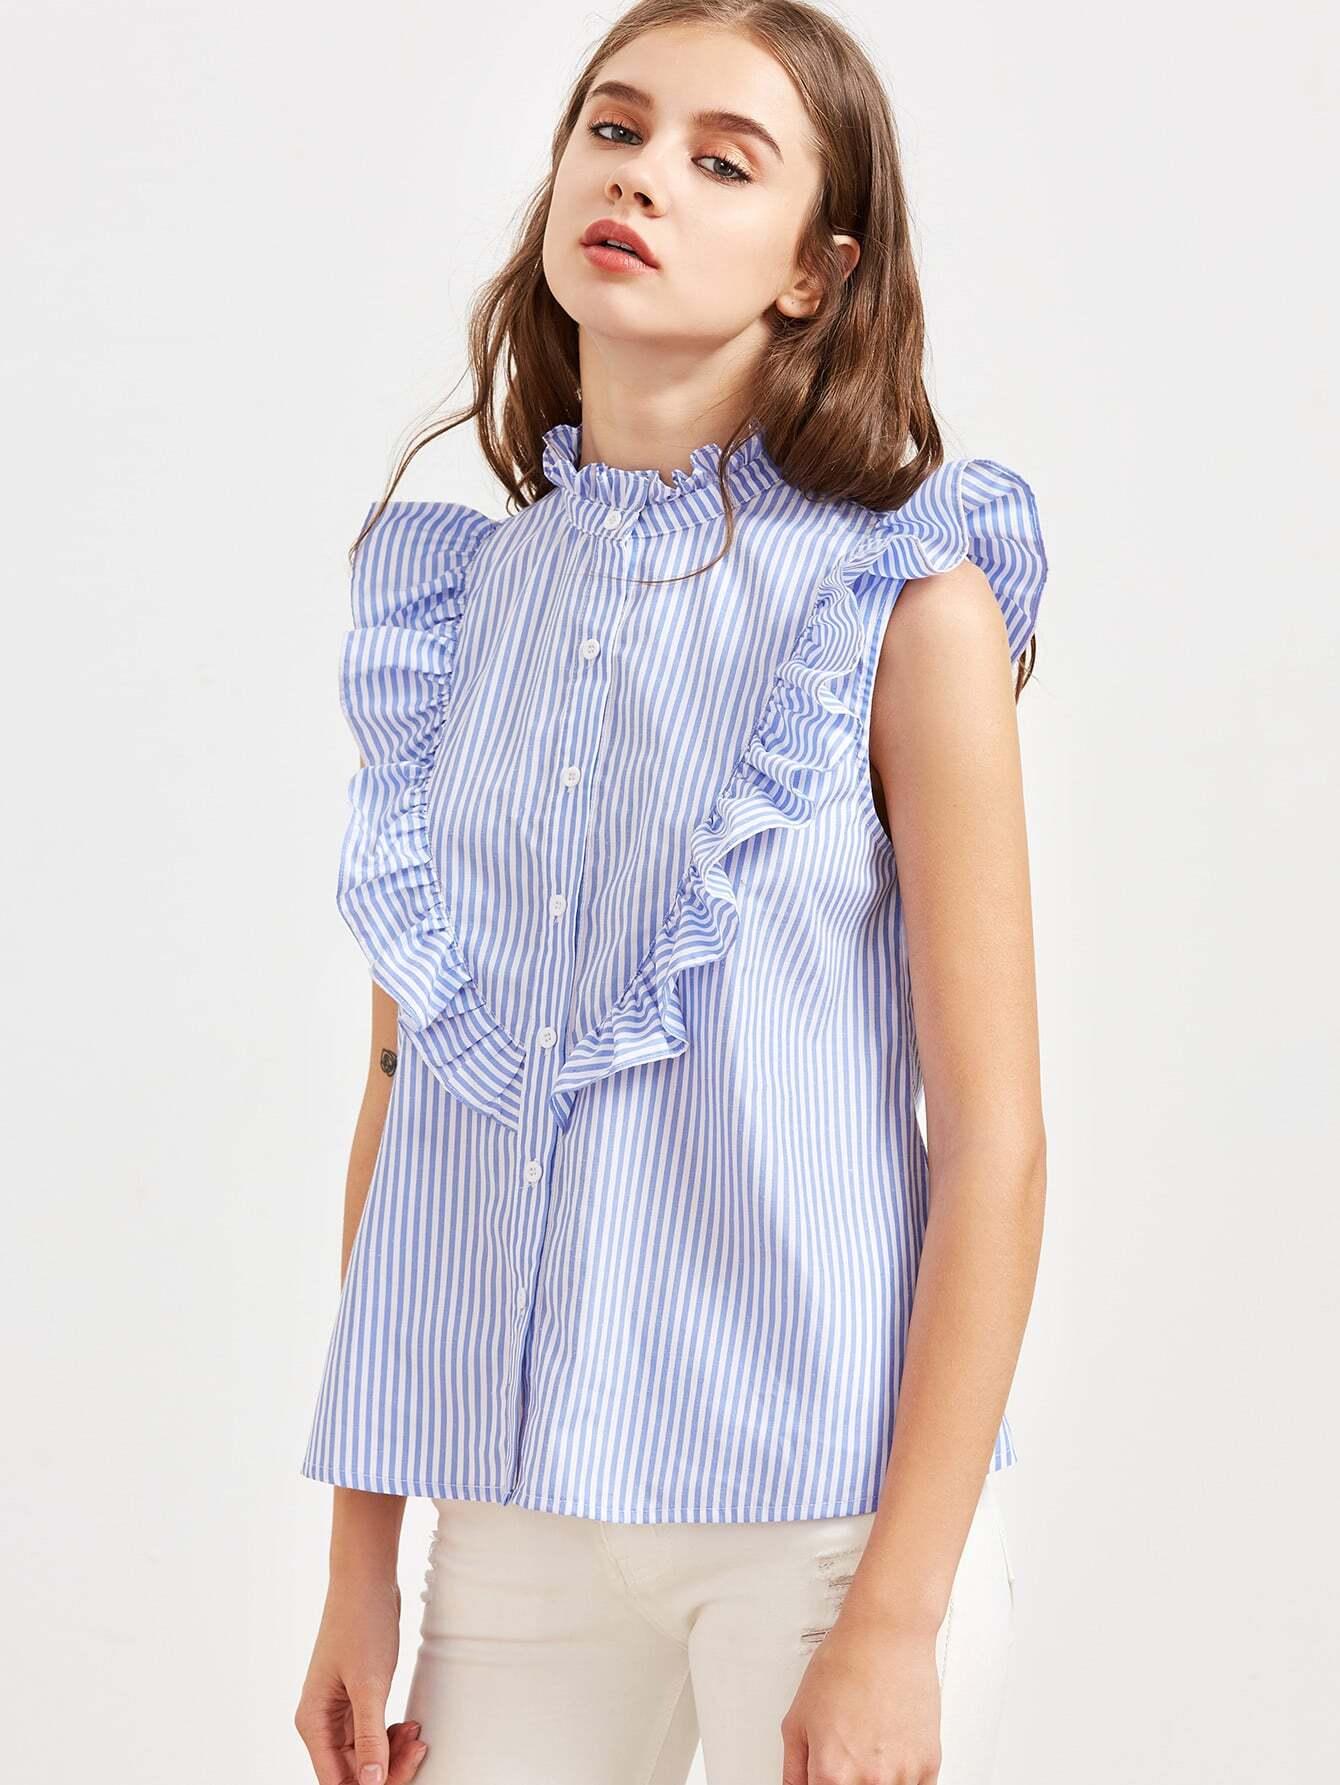 Striped Frill Trim Sleeveless Blouse blouse170213712